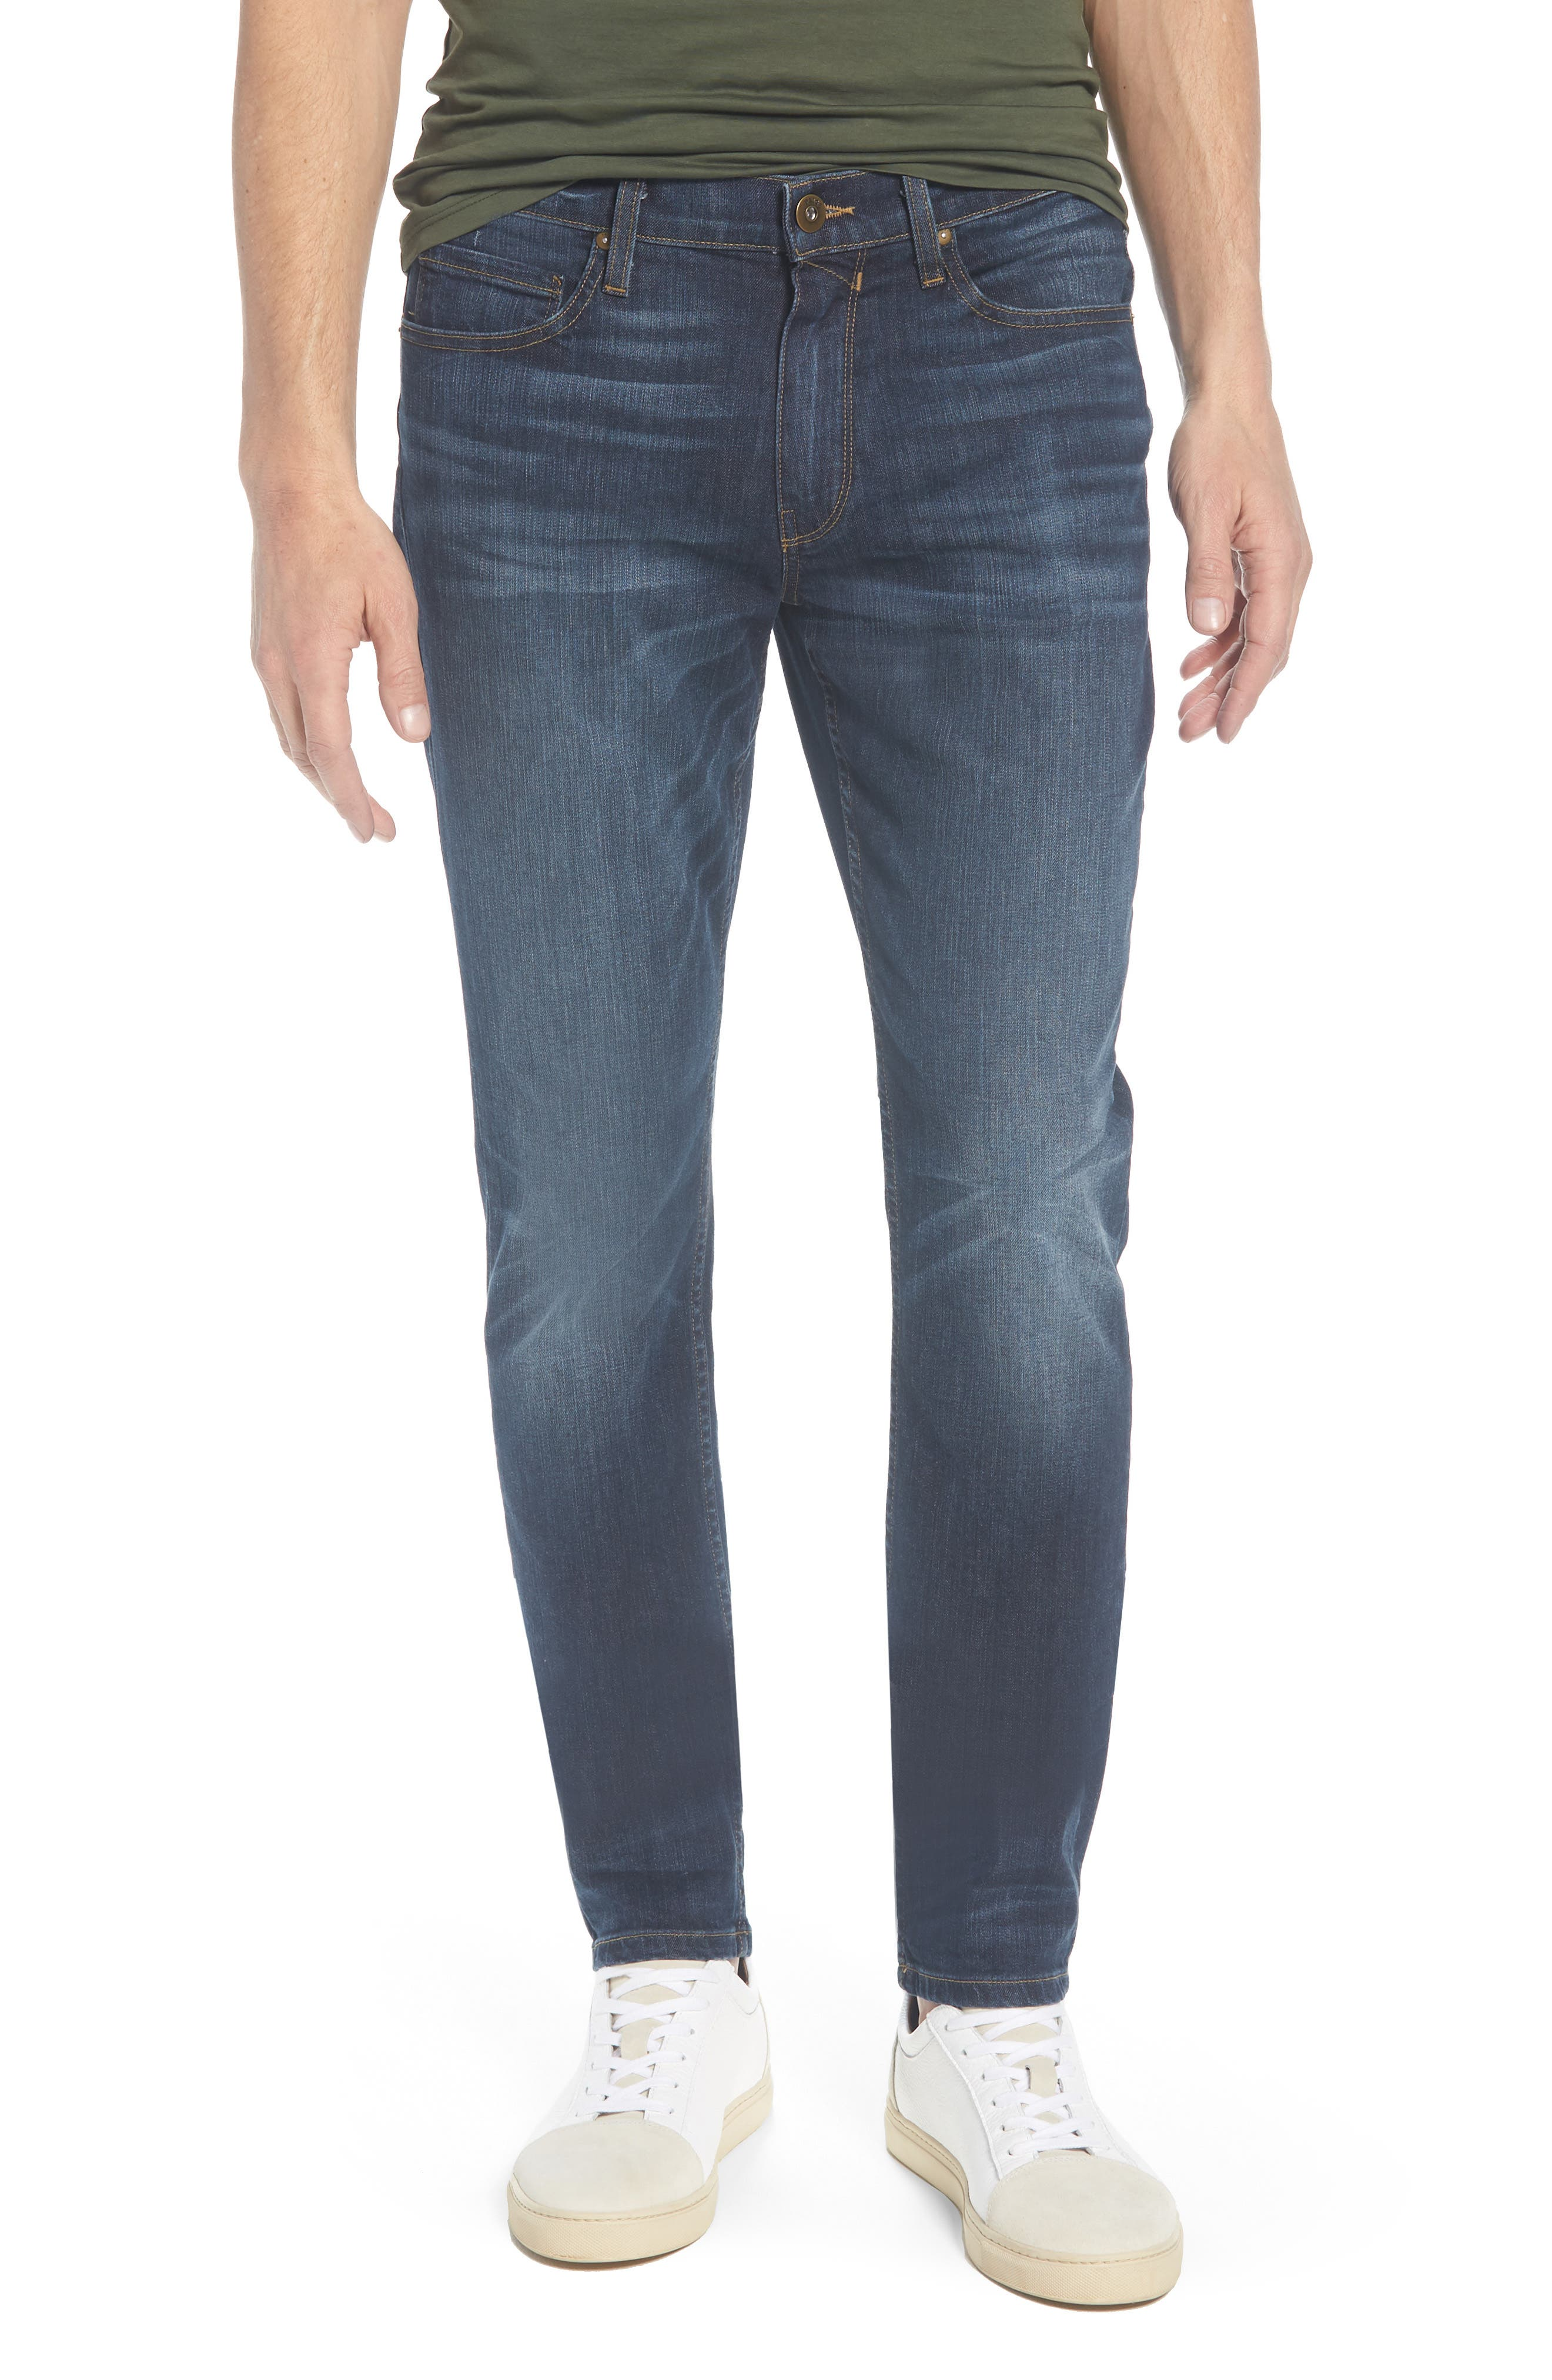 Transcend - Lennox Slim Fit Jeans,                         Main,                         color, Hestan